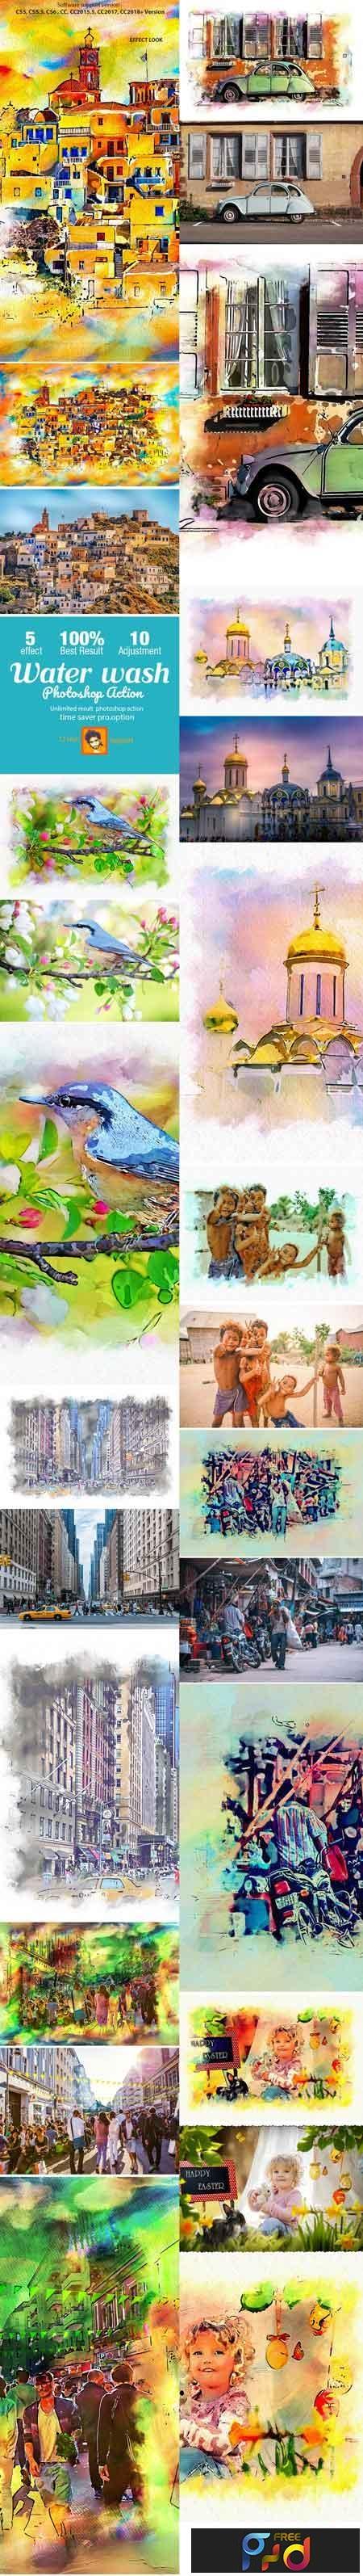 Watercolor Wash Photoshop Action 22727843 1